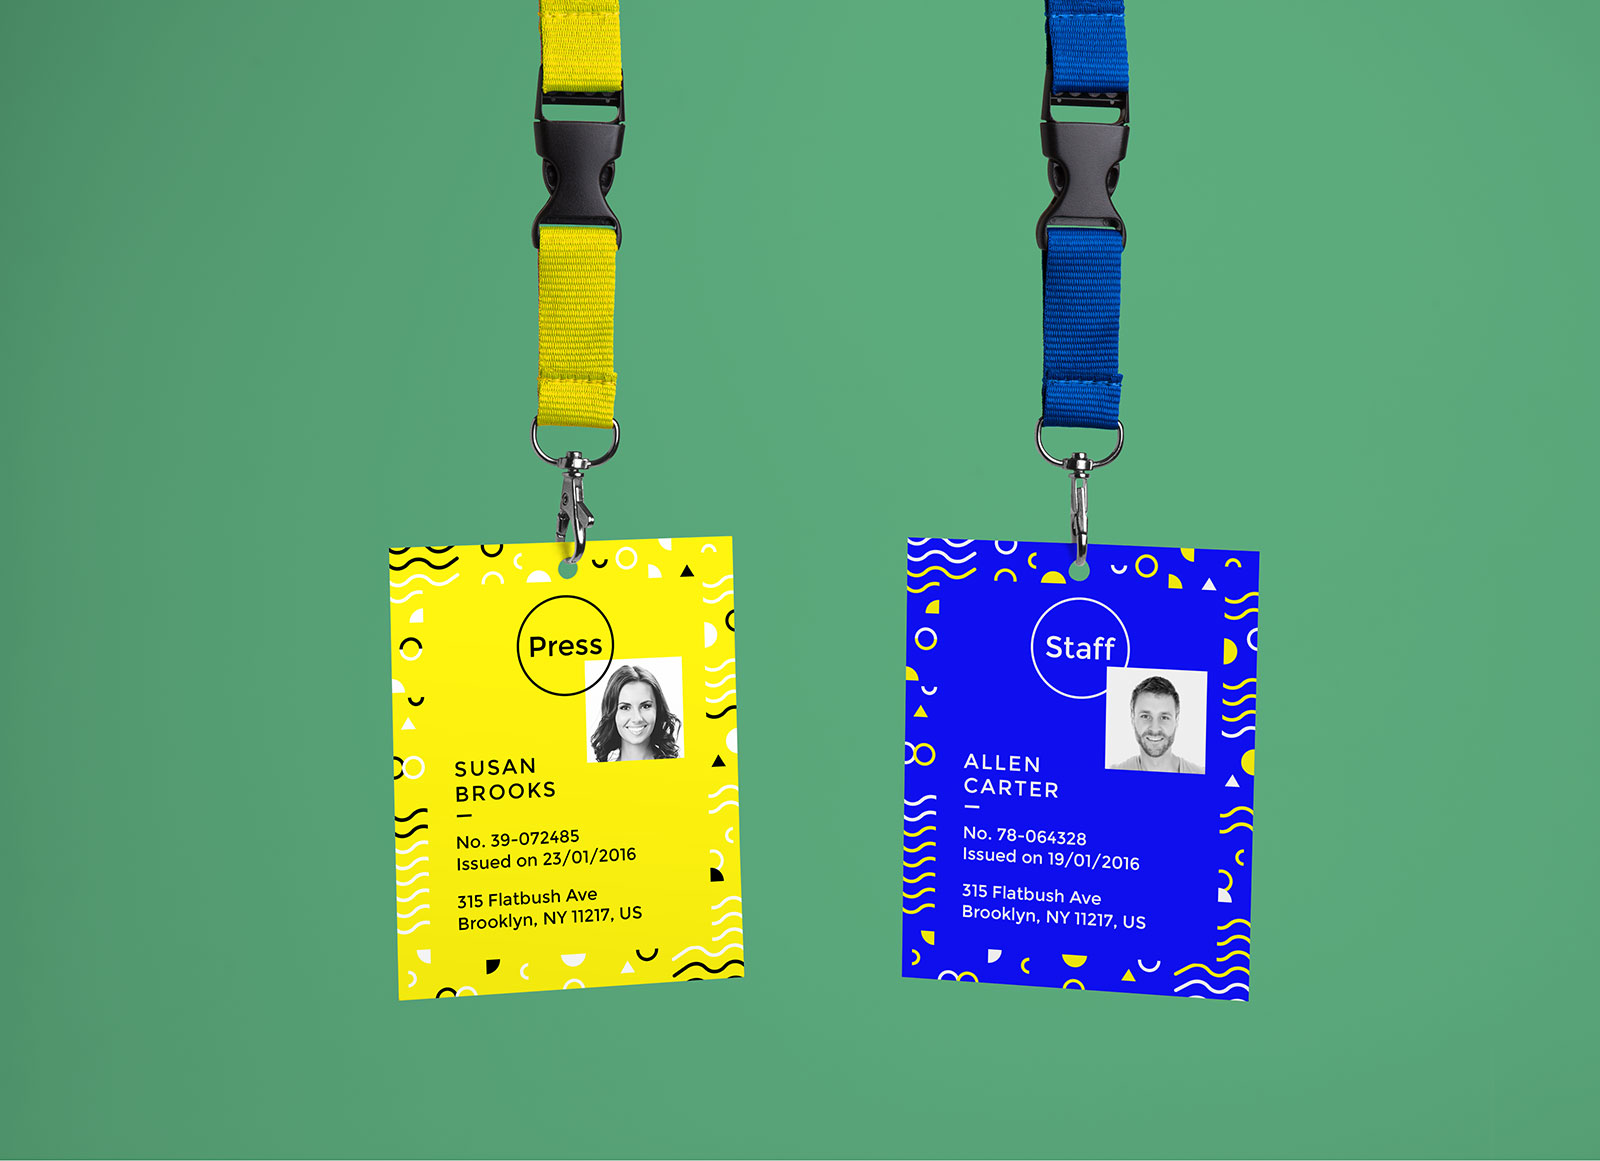 Free Company ID Card Mockup PSD Good Mockups